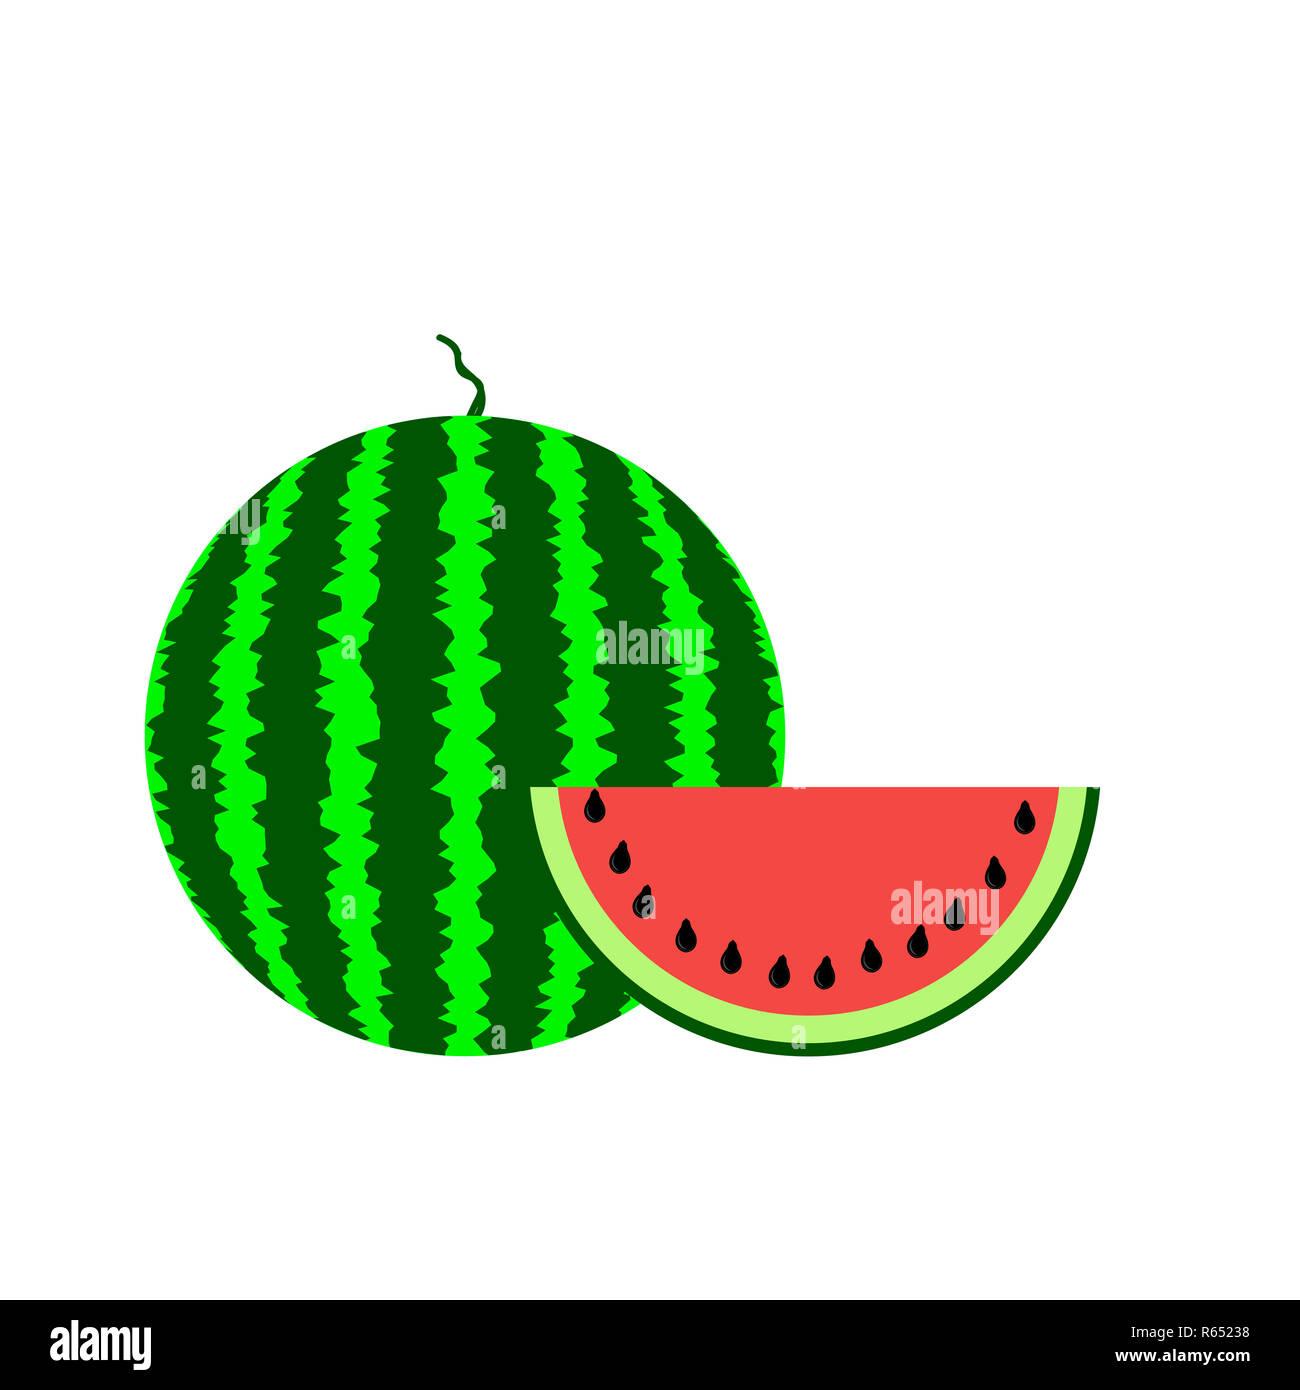 Fresh Slaced Ripe Watermelon - Stock Image